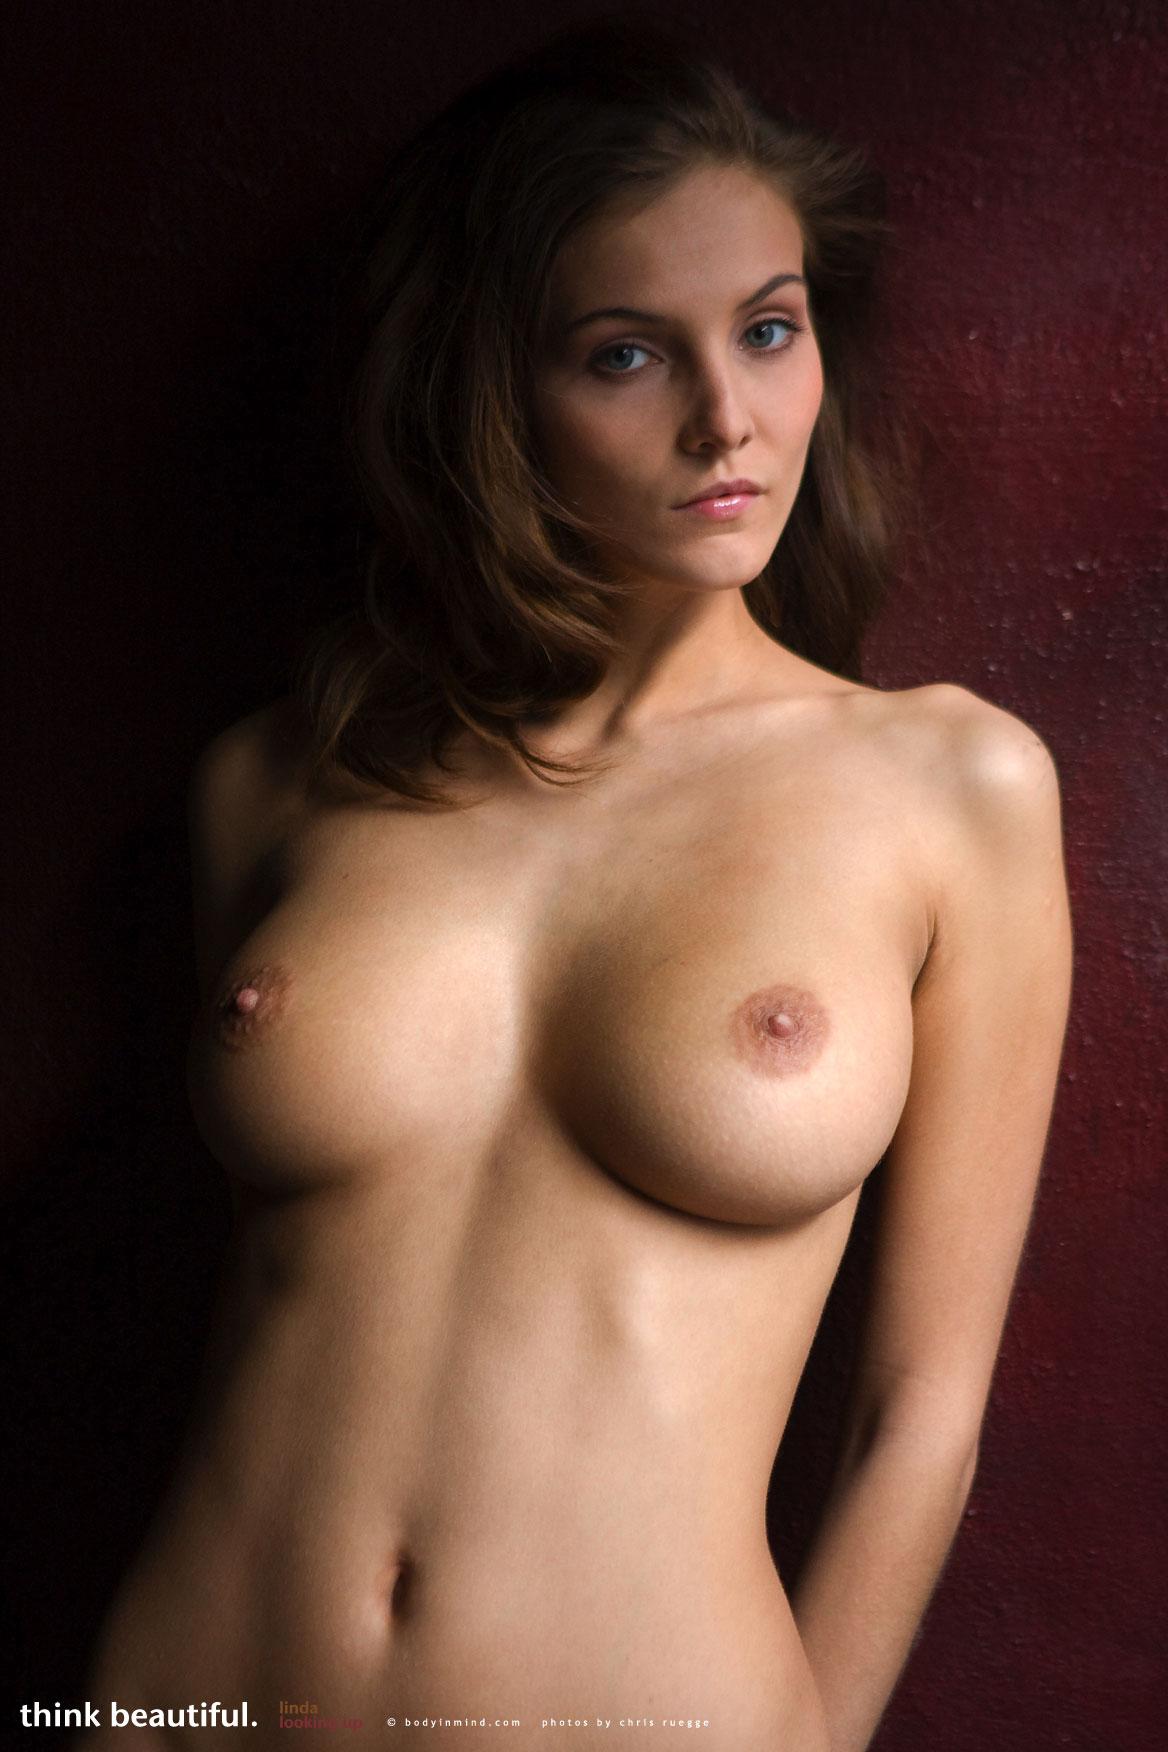 Body nude girl s galleries